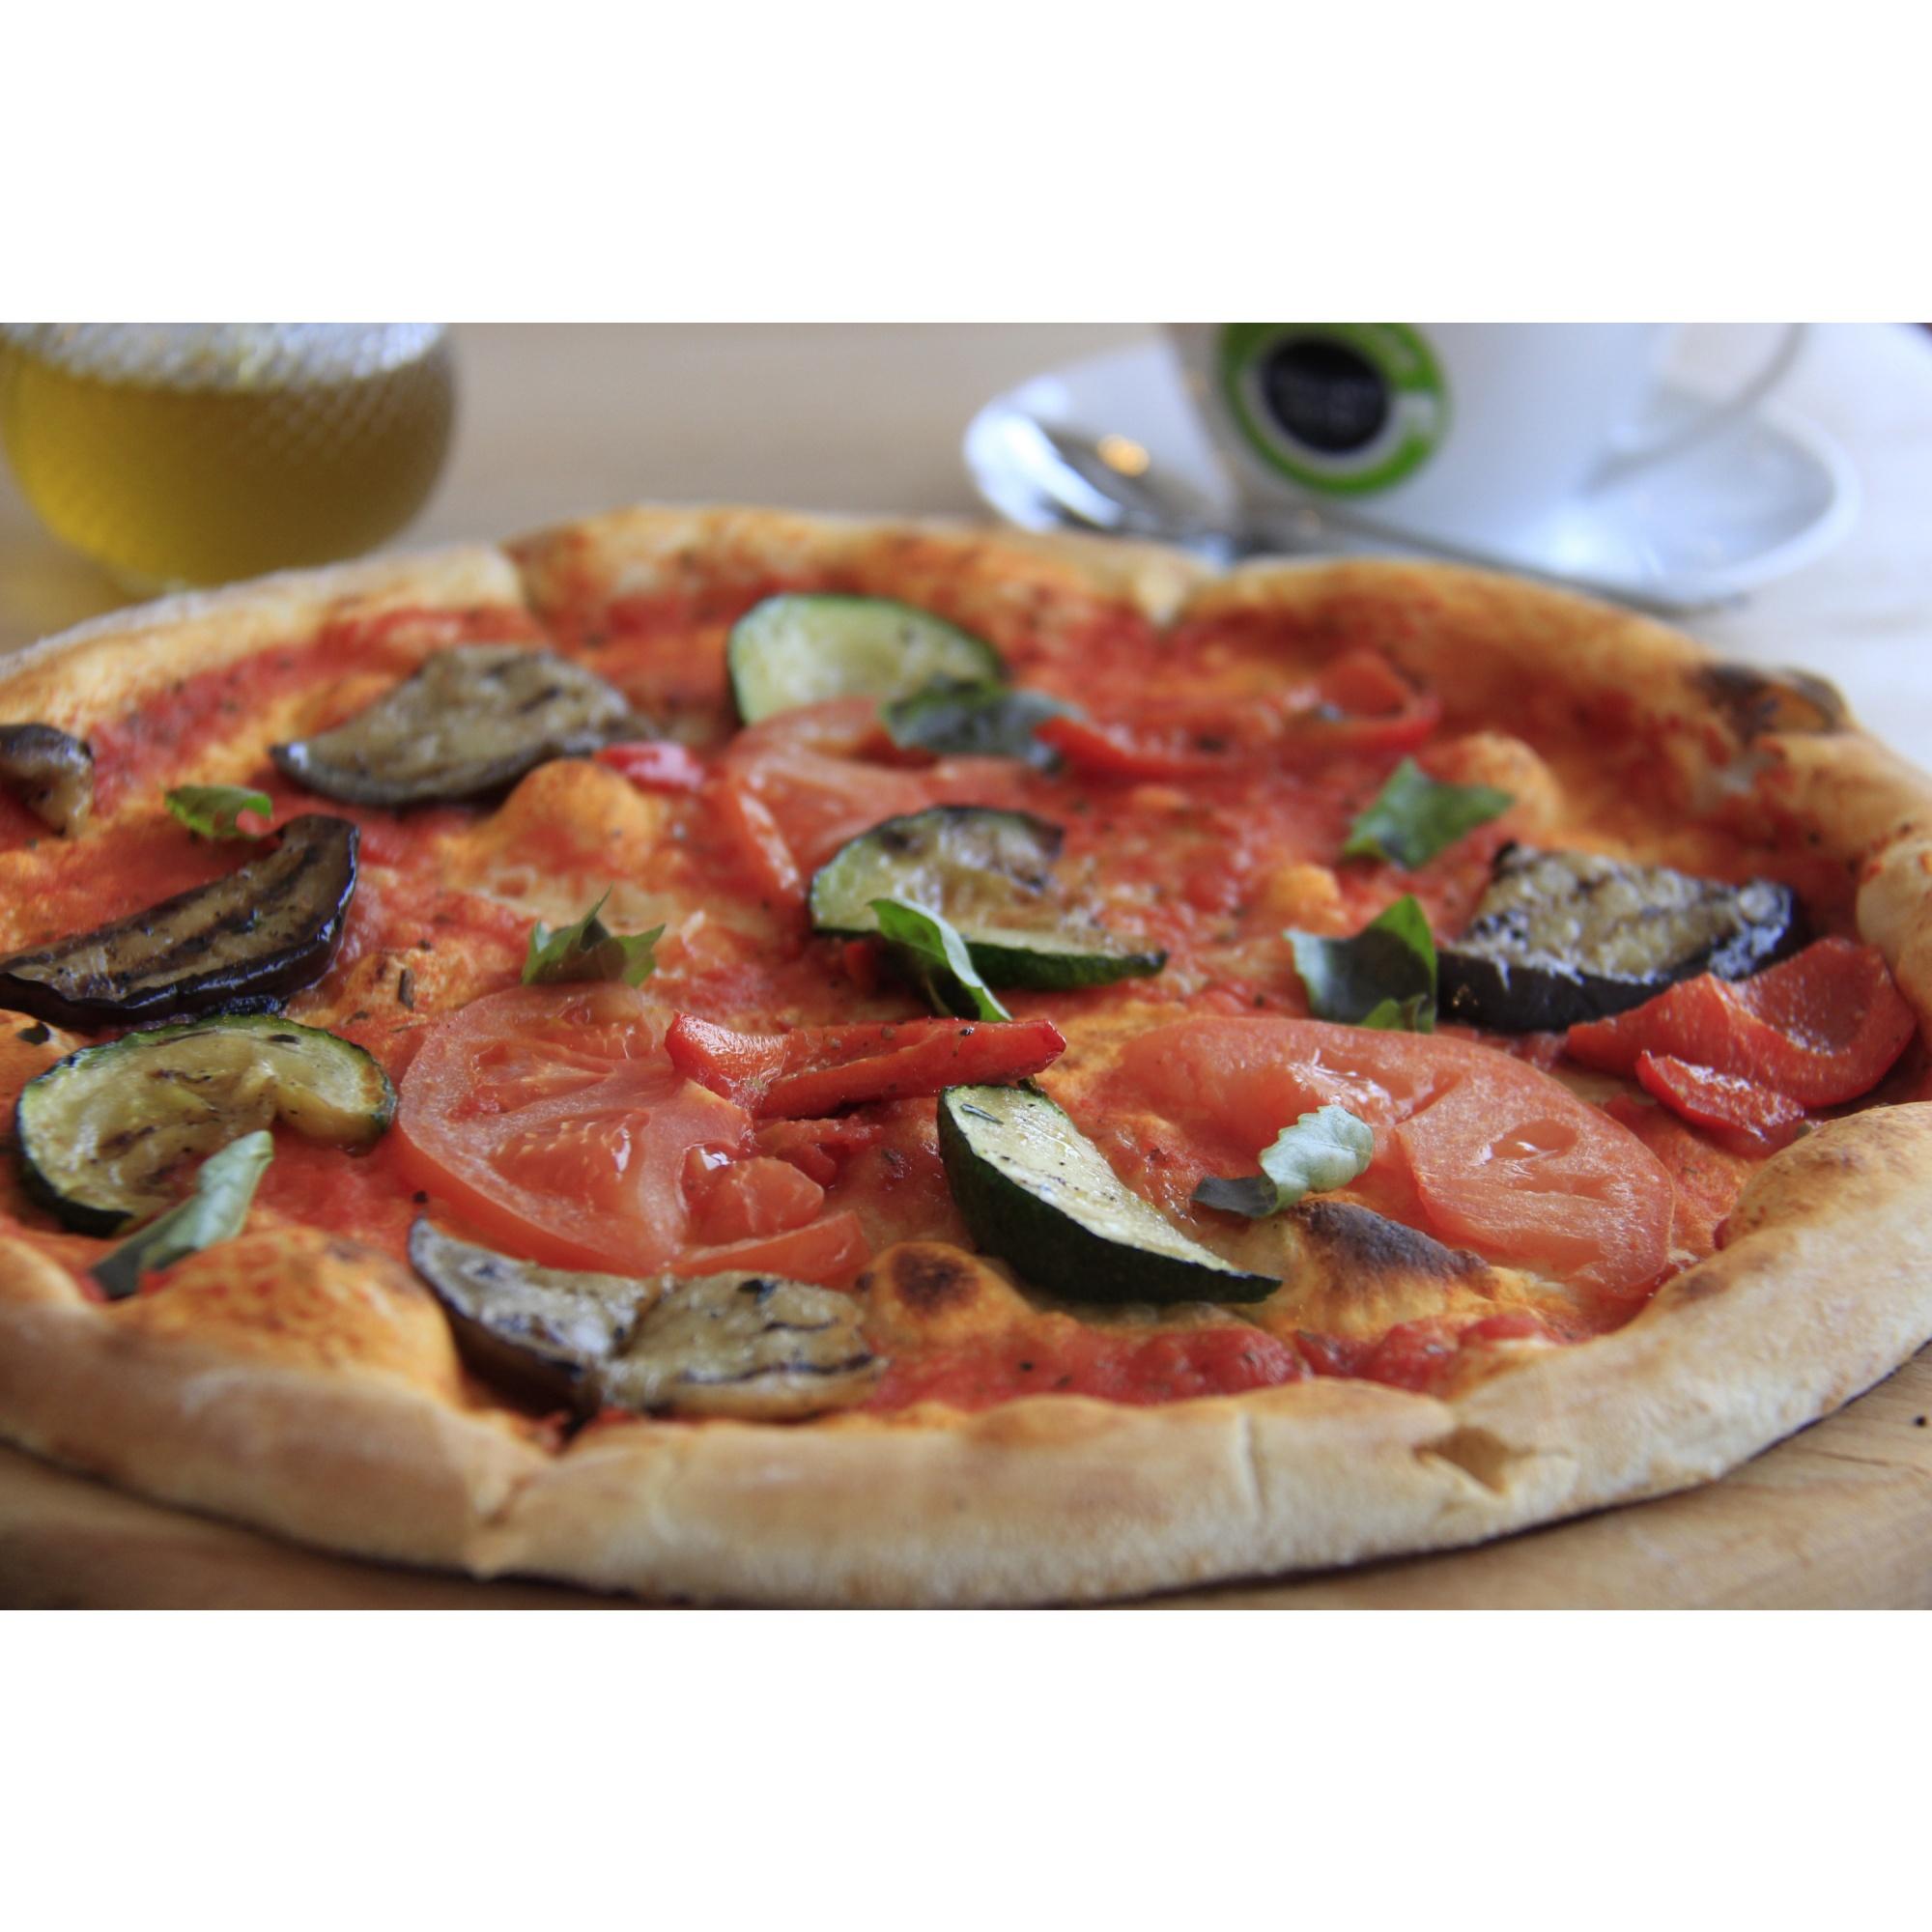 Постная пицца с овощами за 290 рублей